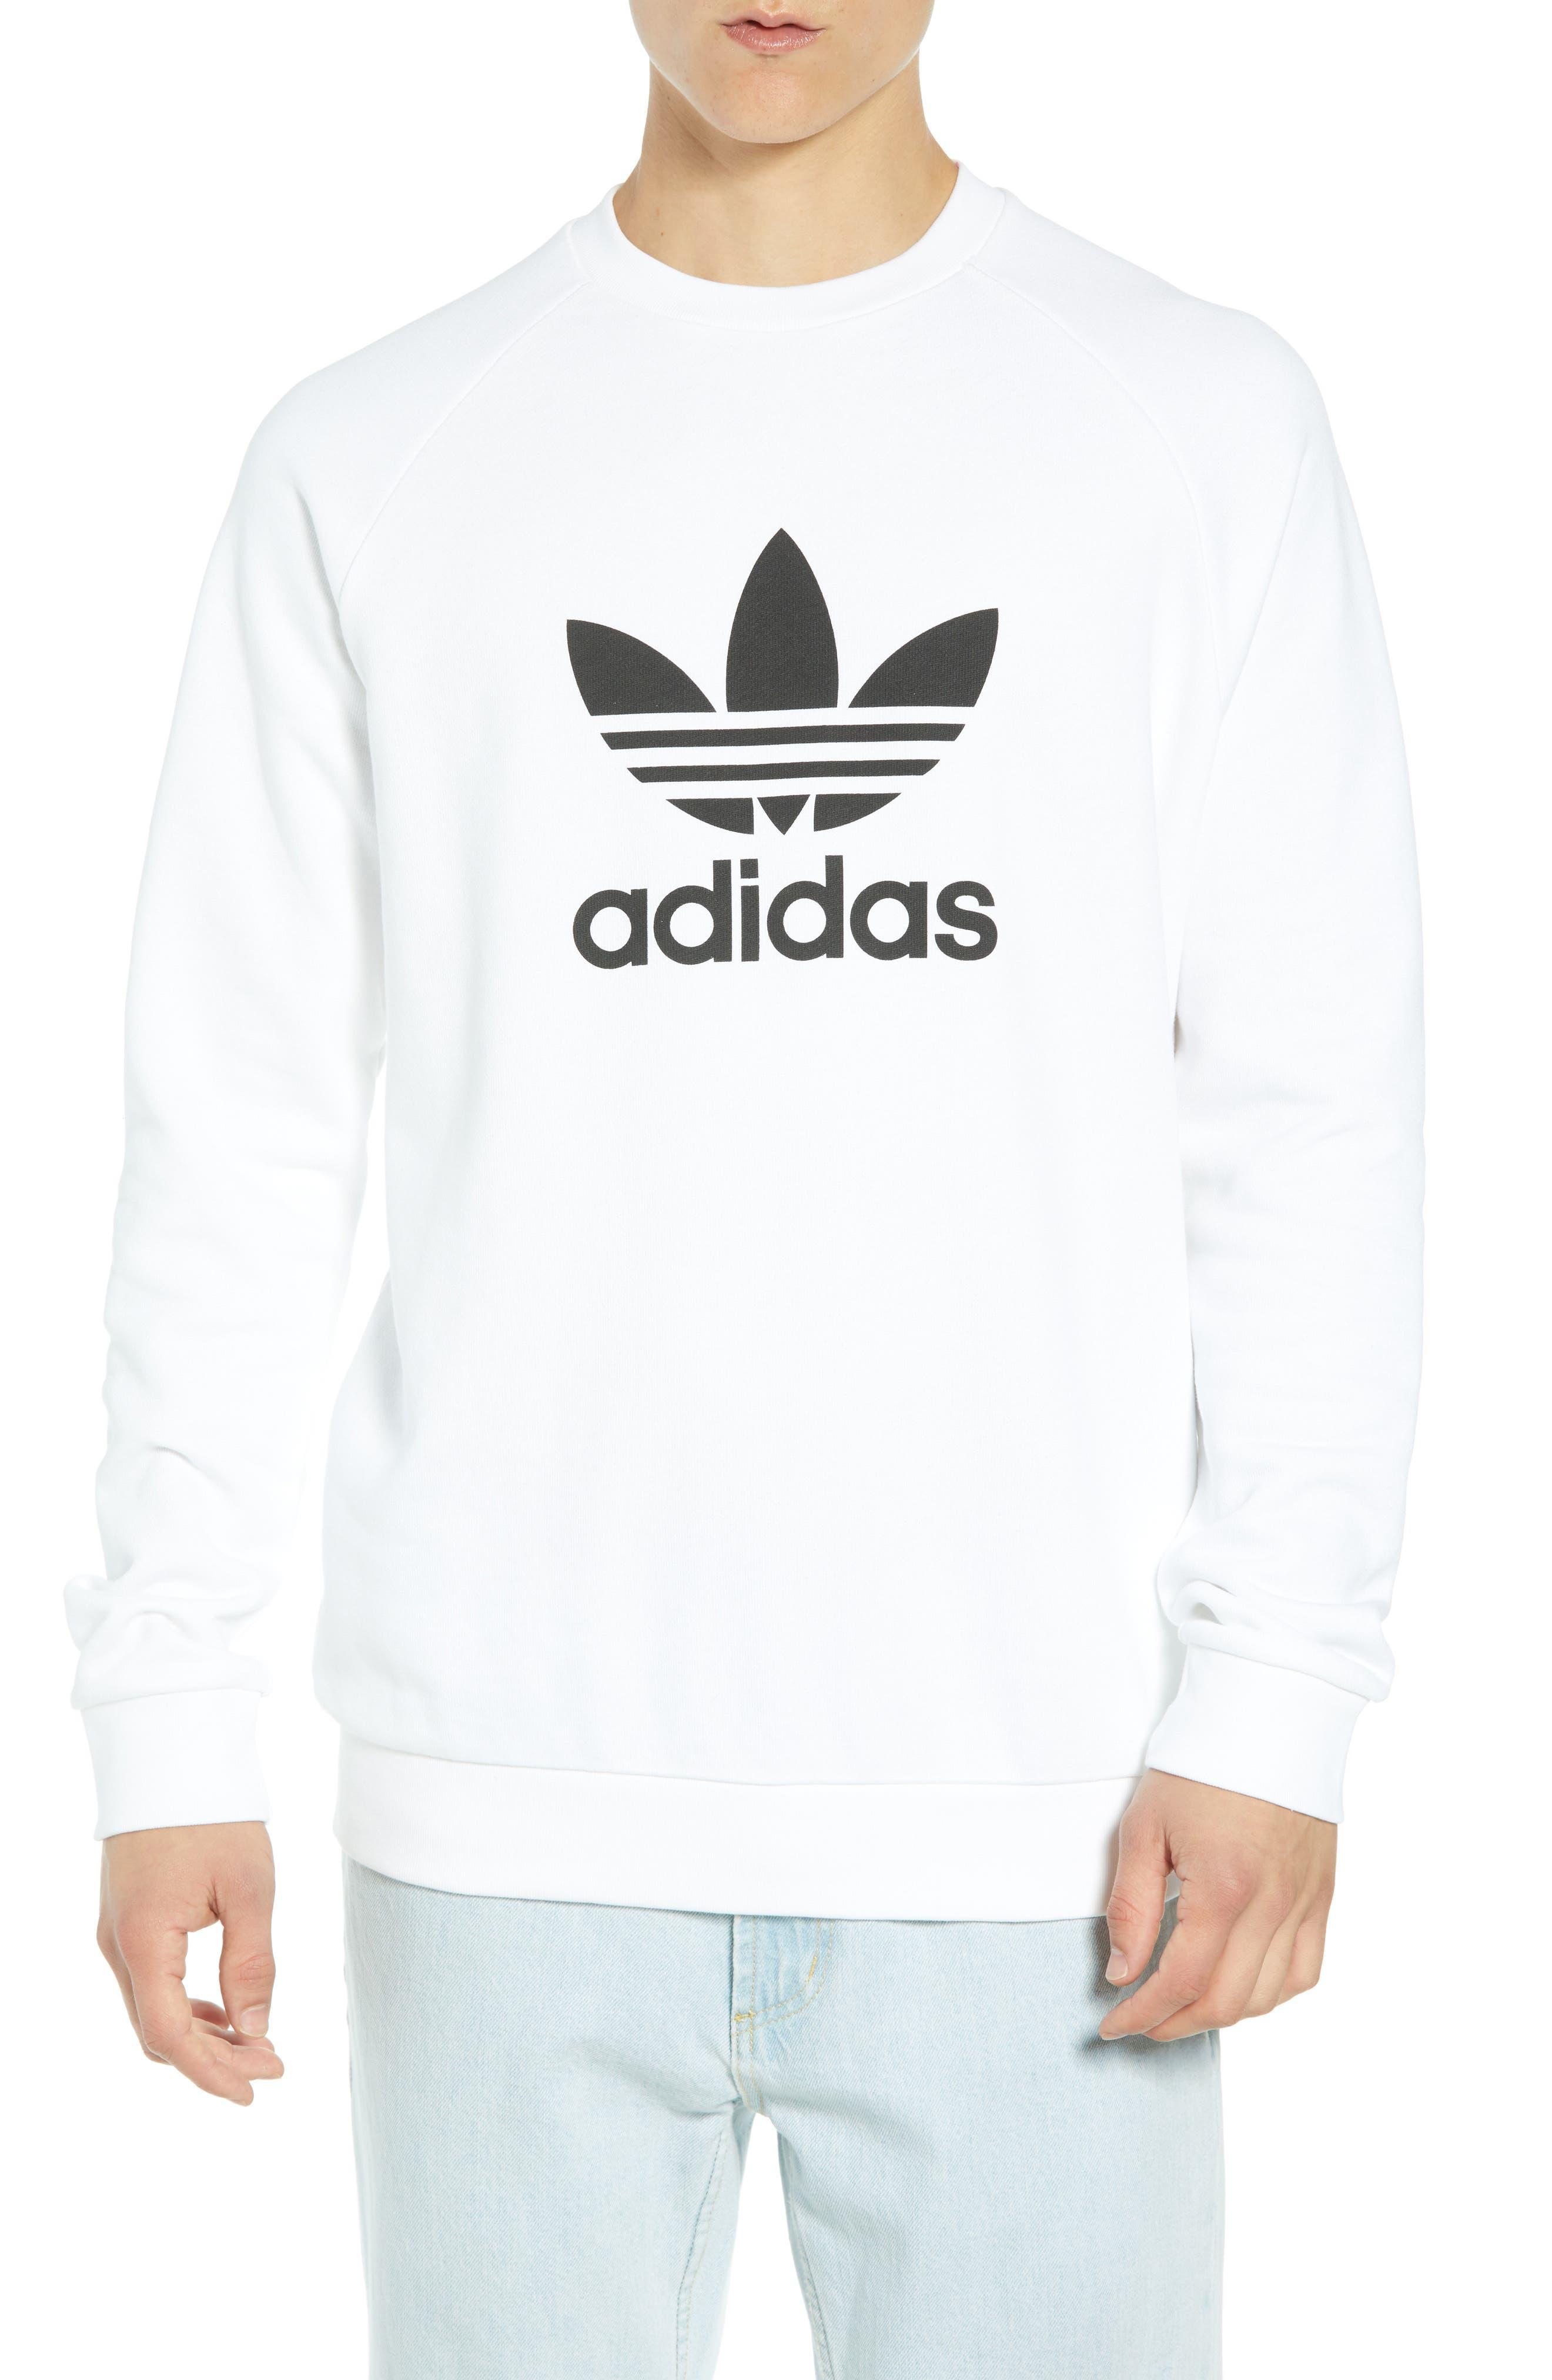 ADIDAS ORIGINALS Trefoil Sweatshirt, Main, color, WHITE